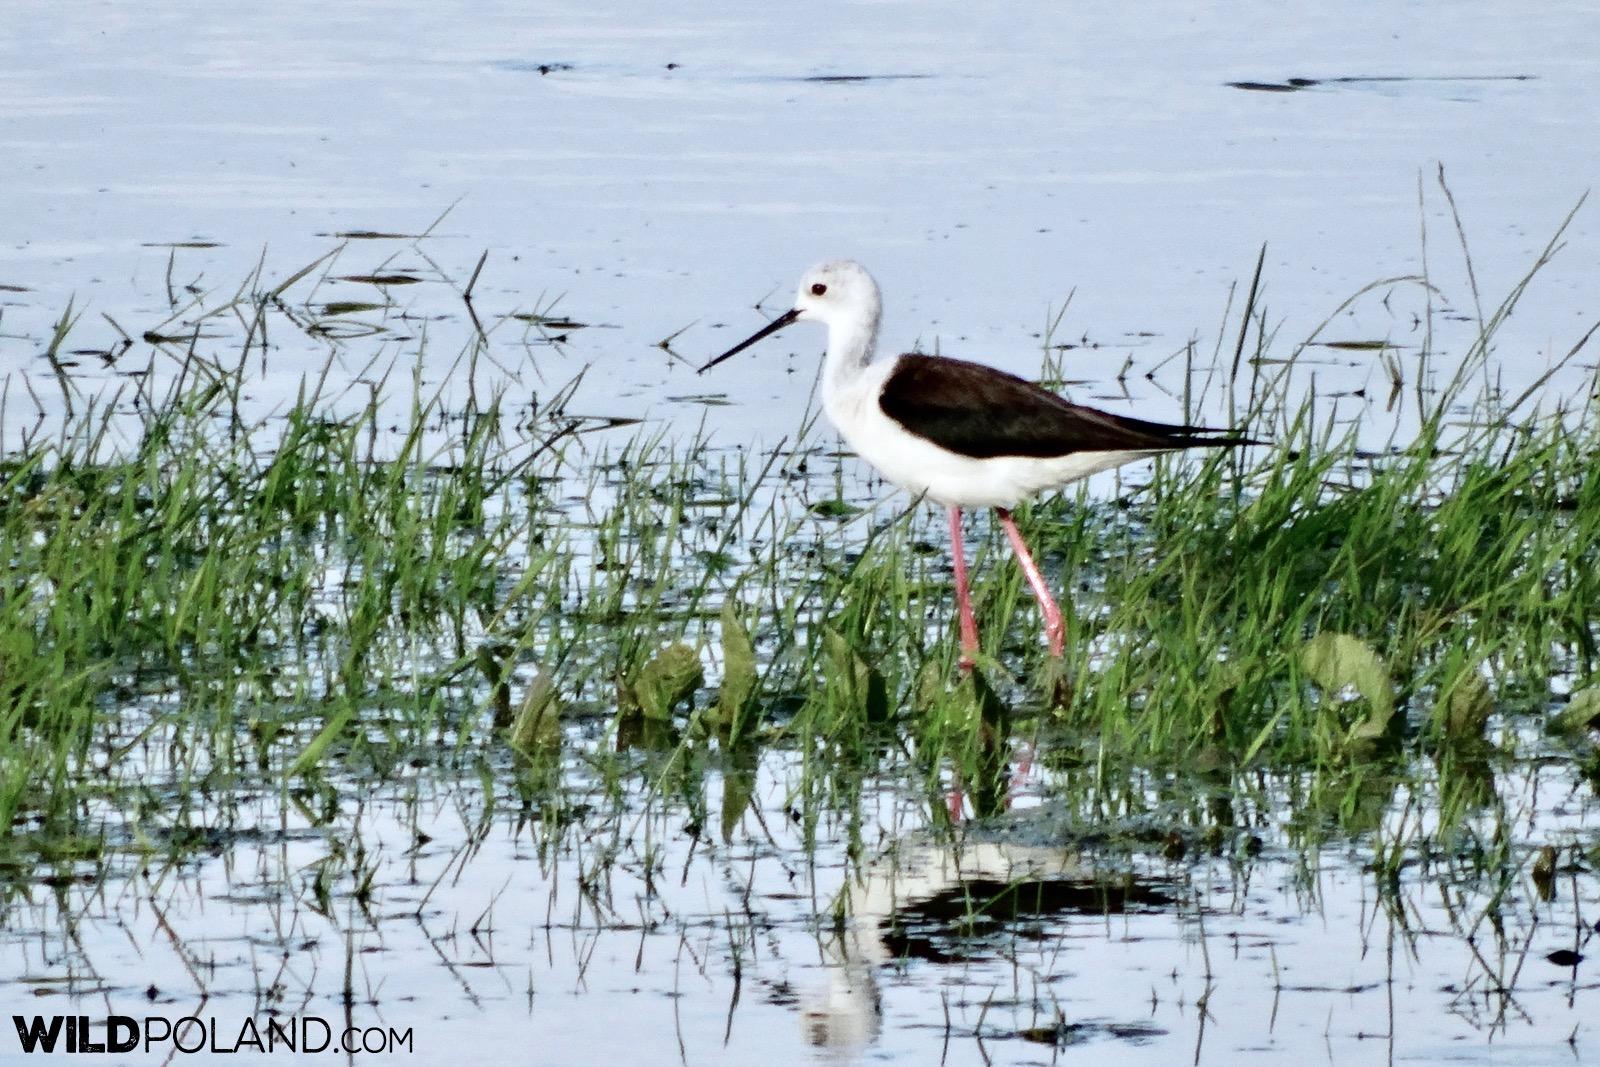 Black winged stilt at Biebrza Marshes, photo by Piotr Dębowski